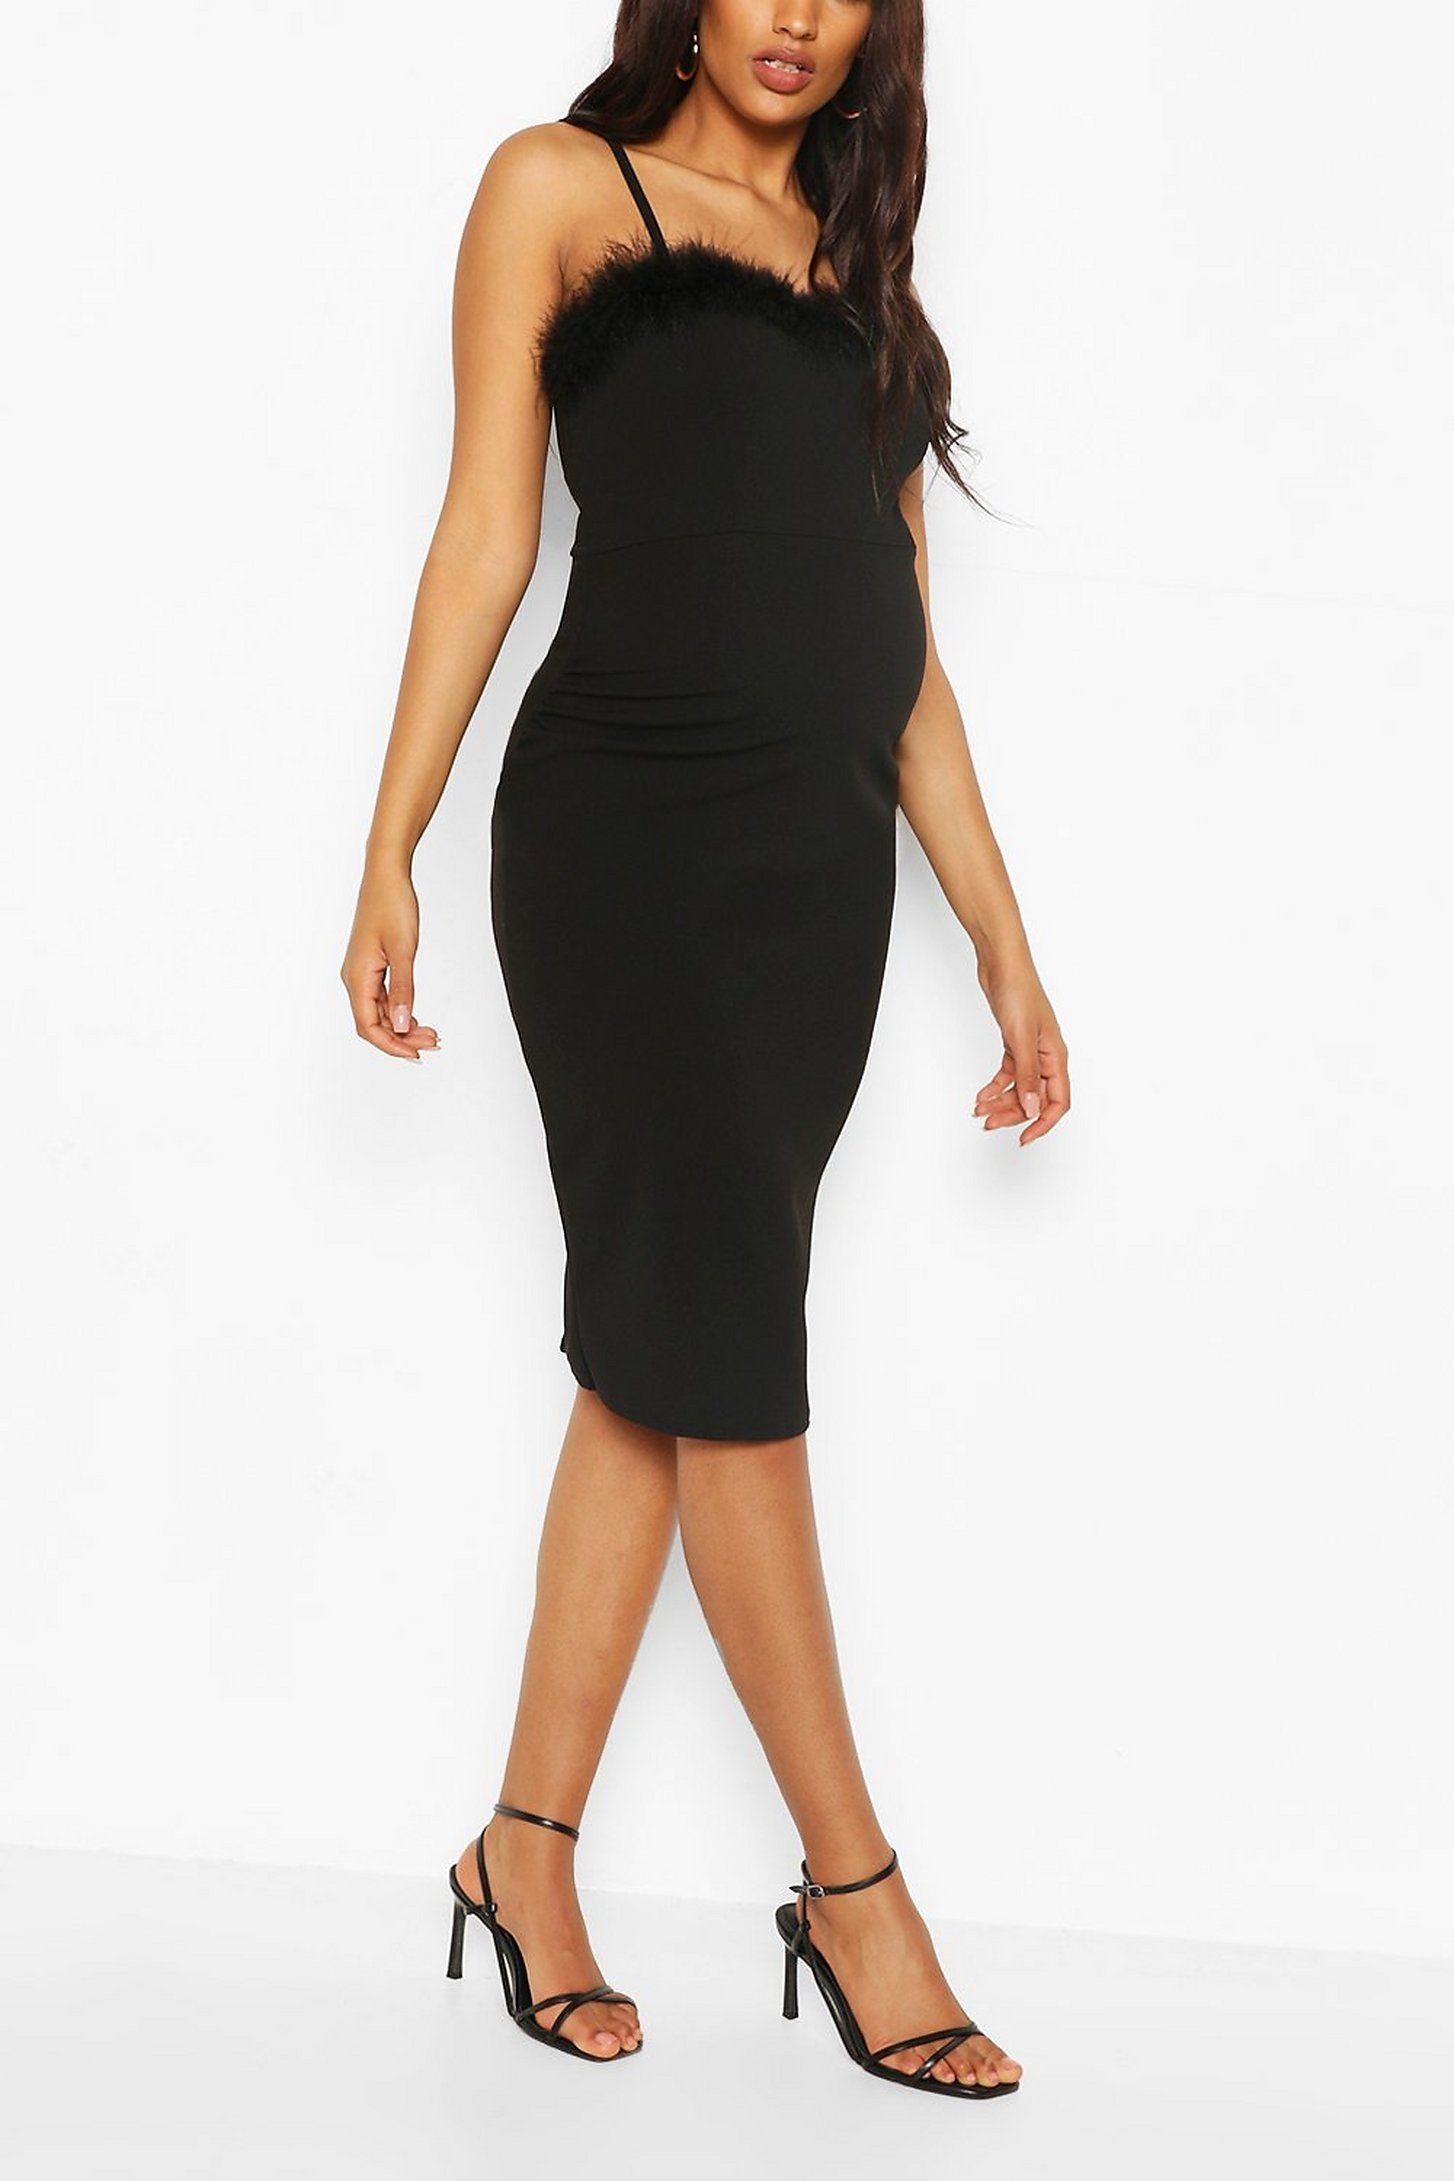 Maternity Feather Trim Midi Bodycon Dress Boohoo Bodycon Dress Black Bodycon Dress Midi Dress Bodycon [ 2181 x 1454 Pixel ]